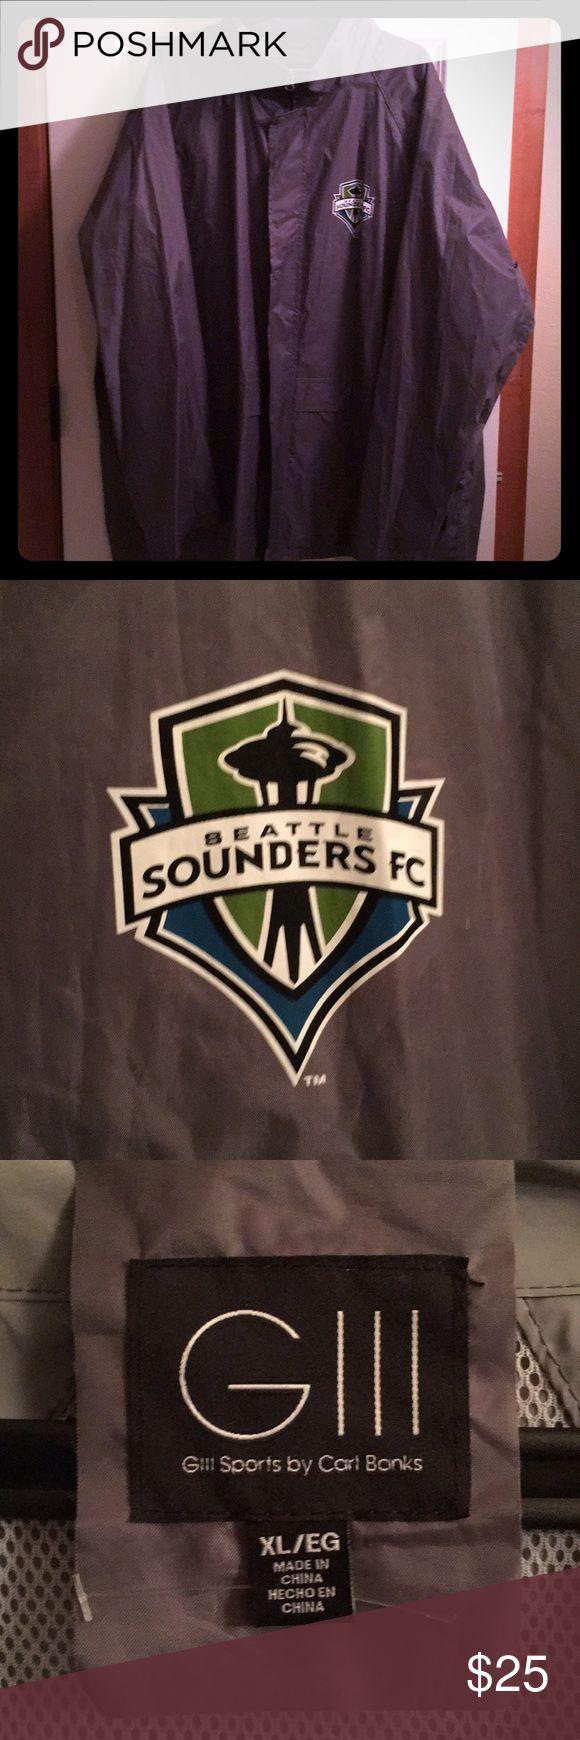 Seattle Sounders gray rain coat 🧥 Never been worn. Seattle Sounders FC rain coat ☔️ 🌧 Has a hood that zips into collar also. GIII sports by Carl Banks Jackets & Coats Raincoats